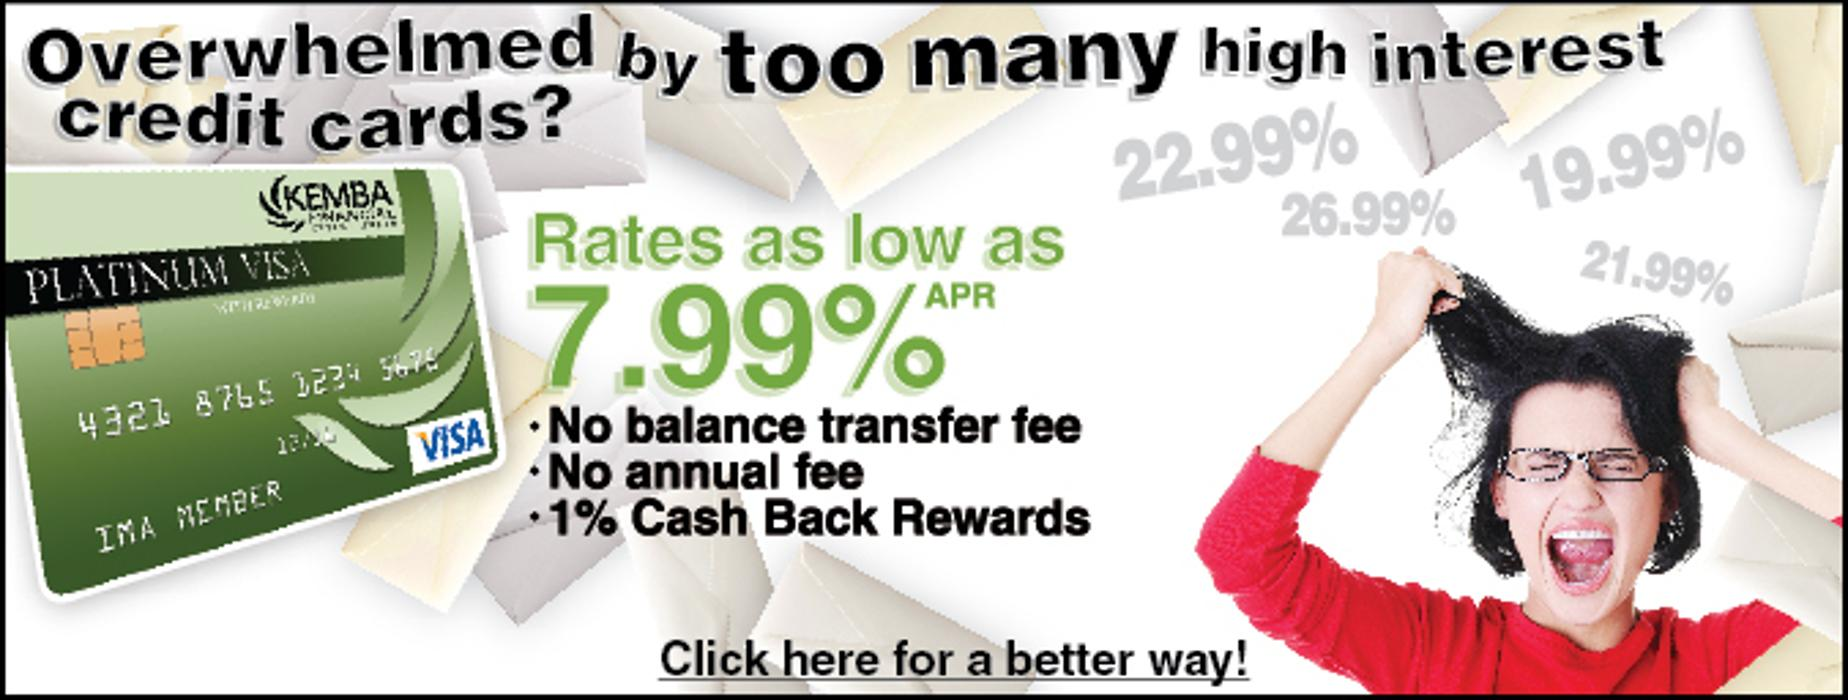 KEMBA Financial Credit Union - Pickerington, OH